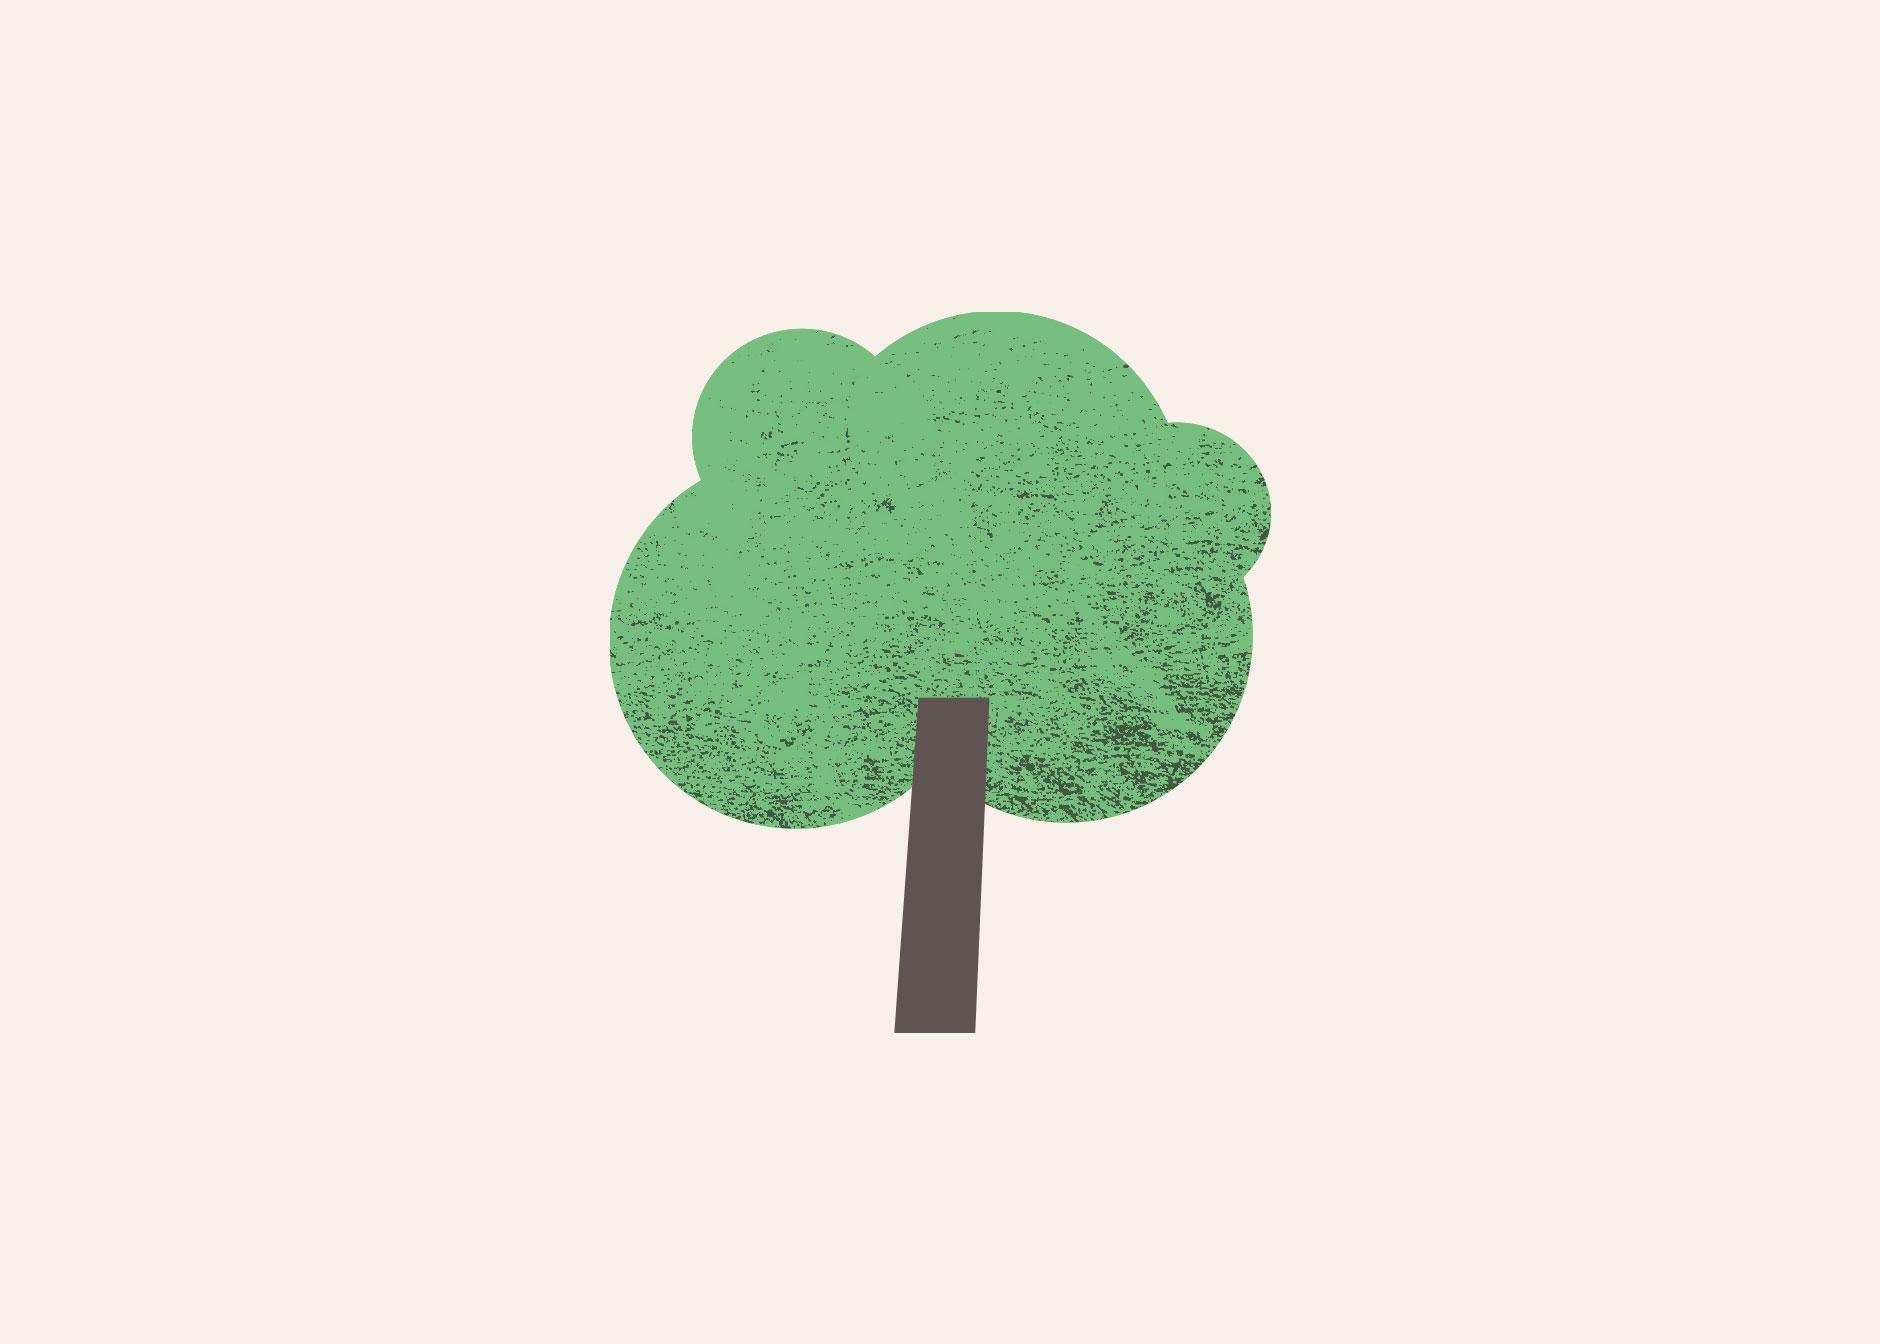 træ-ikon